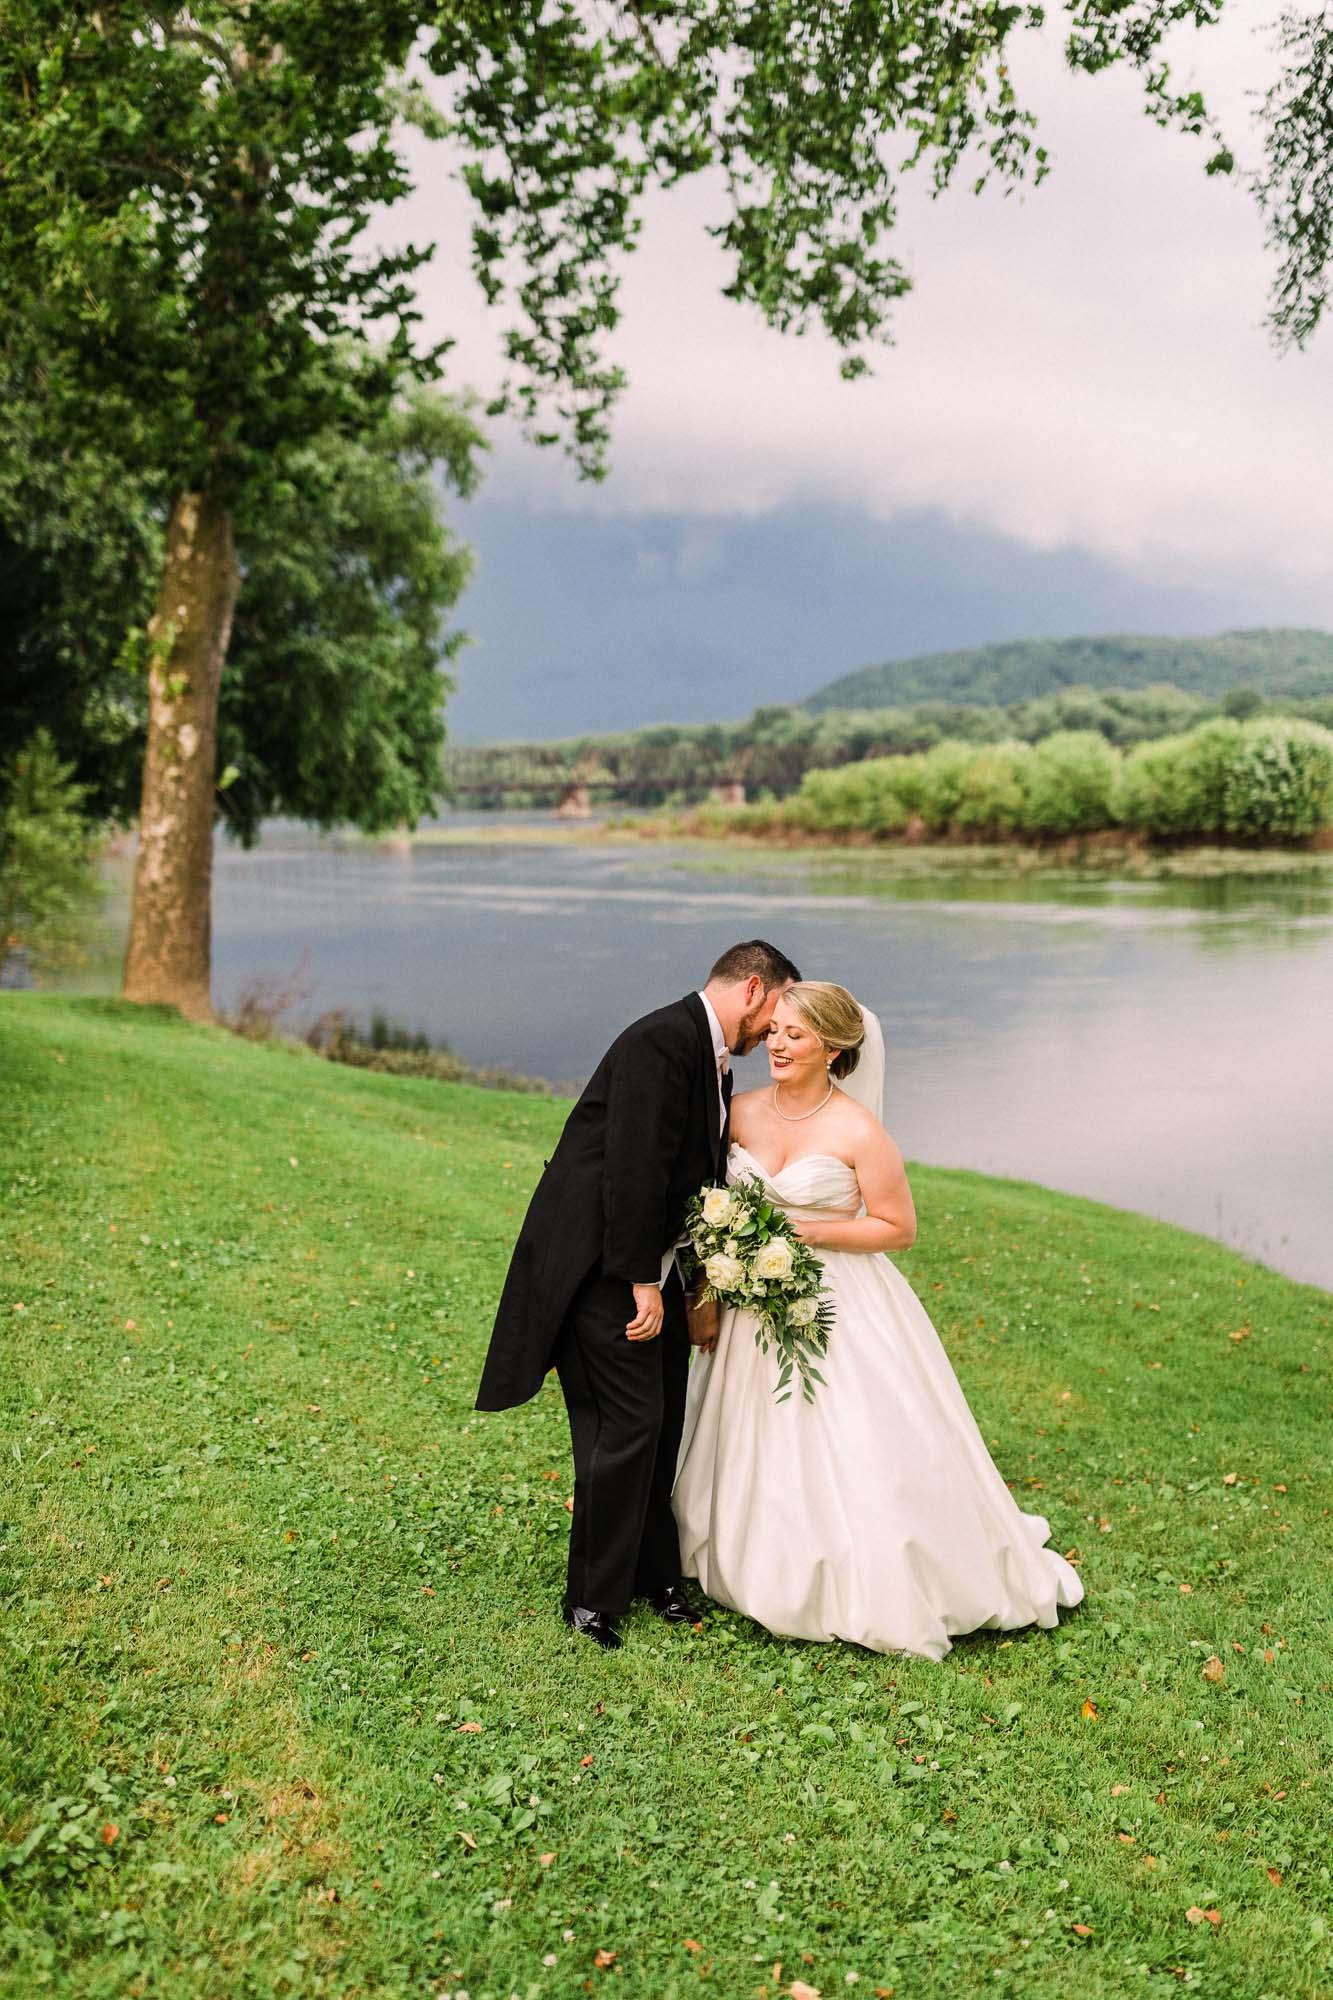 isle-of-que-wedding-6956.jpg